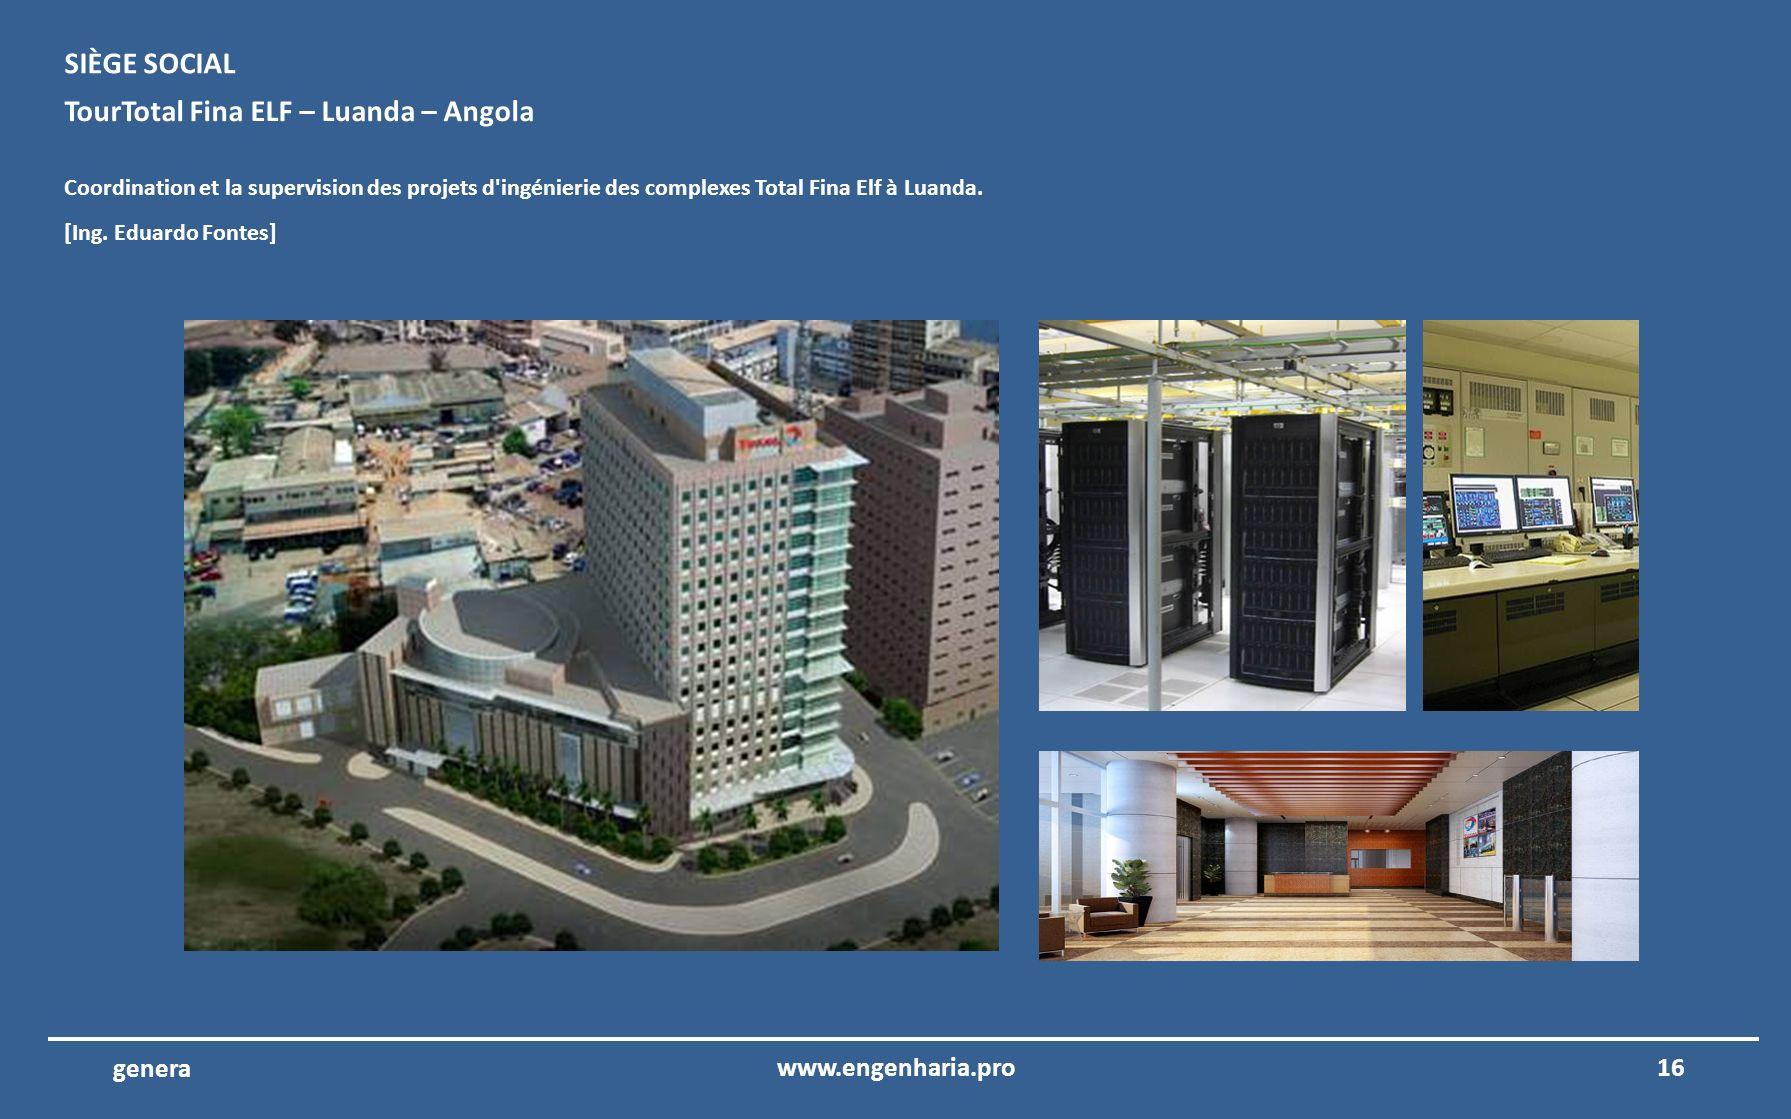 15www.engenharia.pro genera Aéroport international de Algarve – Faro – ANA Coordination et la supervision des projets de la reconstruction des termina